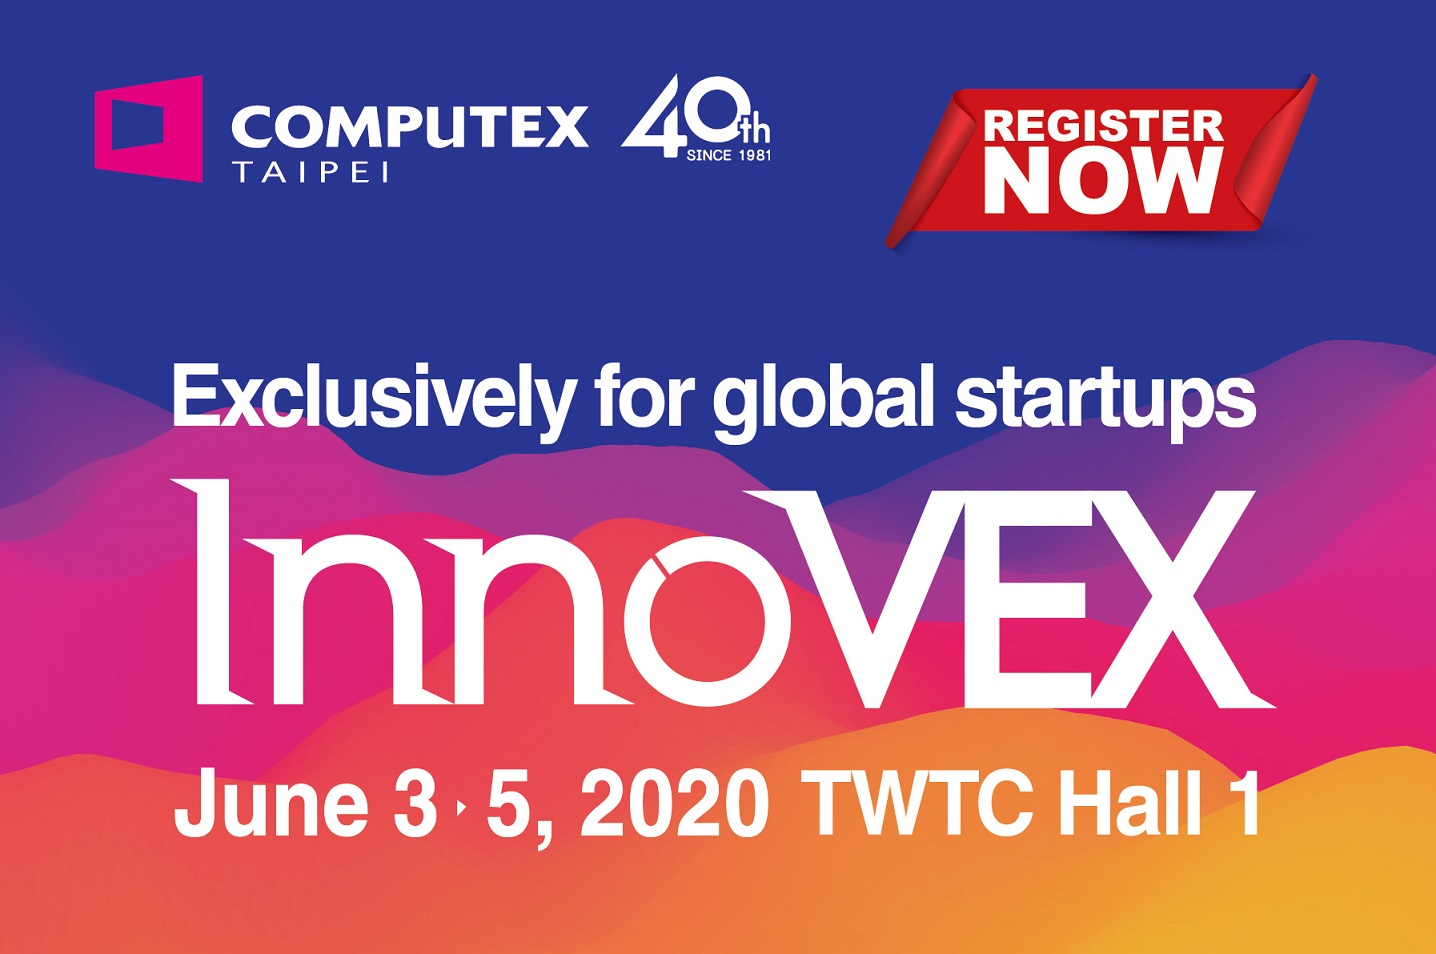 COMPUTEX InnoVEX 2020